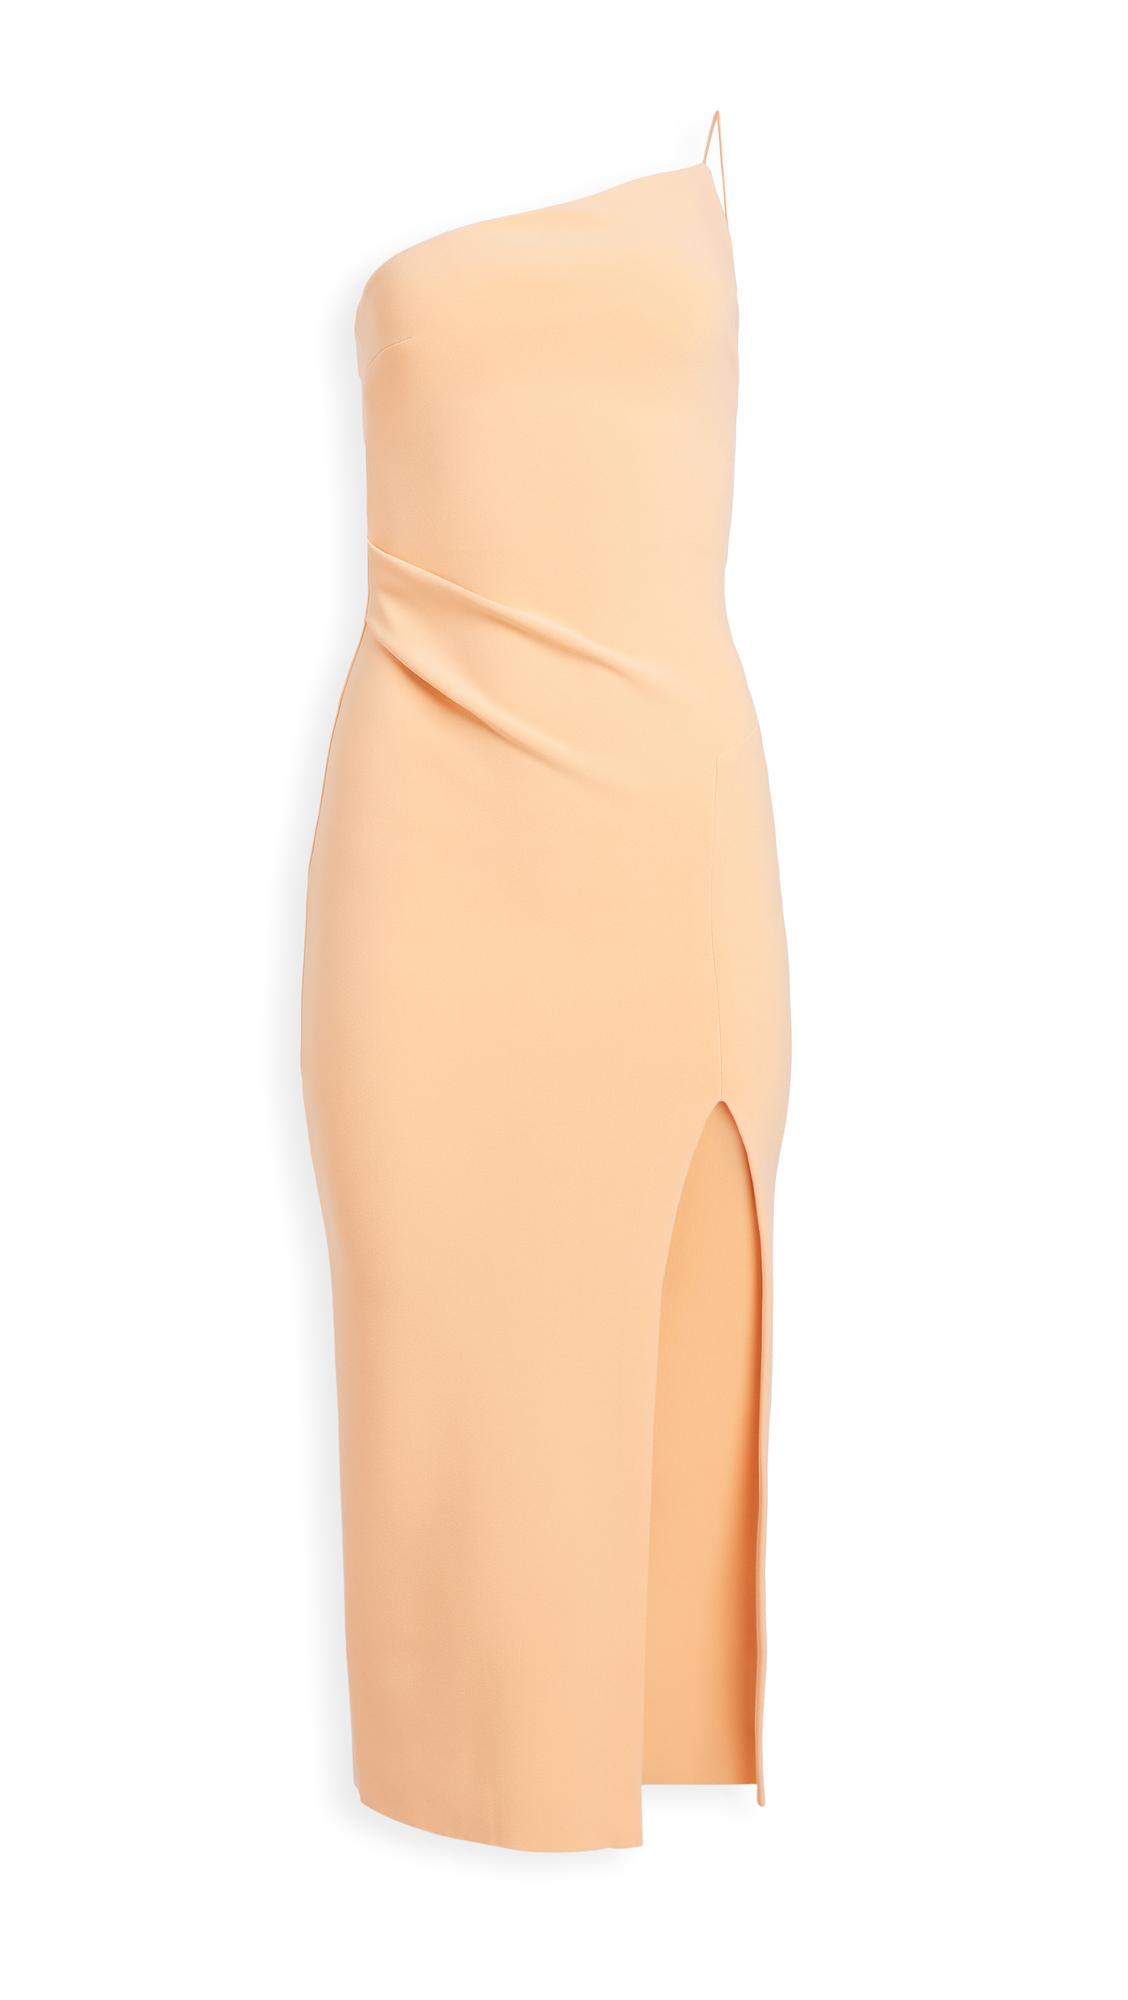 Bec & Bridge Raphaela Midi Dress - 30% Off Sale